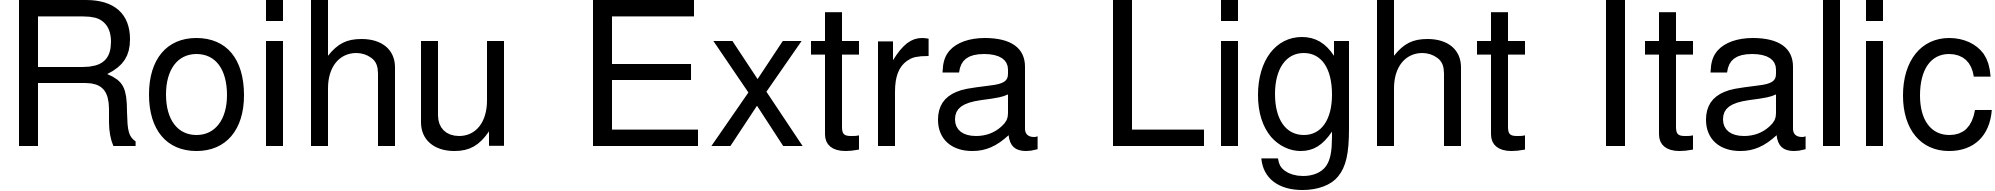 Roihu Extra Light Italic